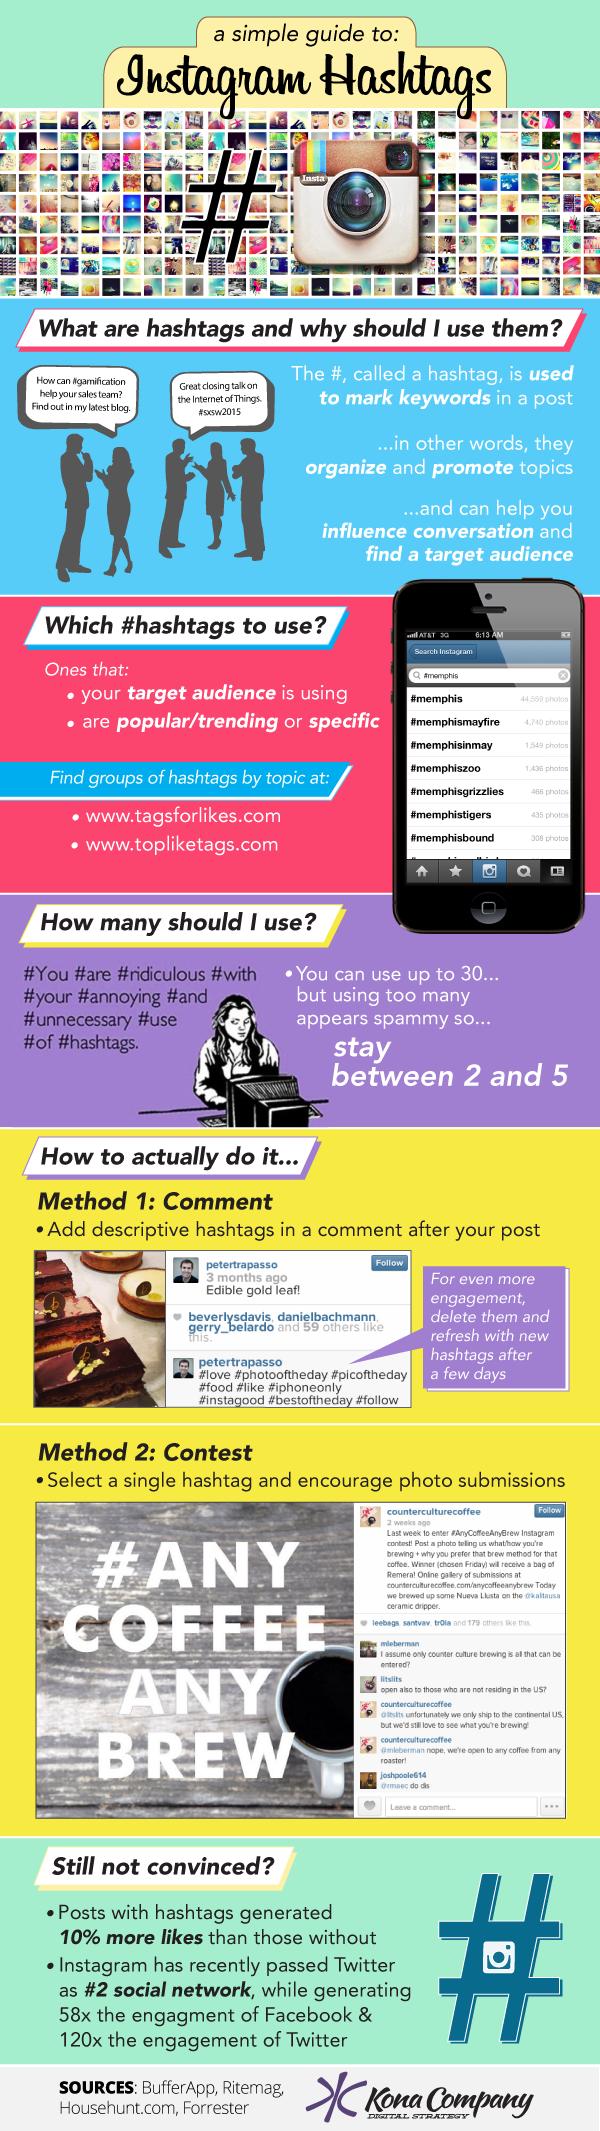 instagram hashtag infographic